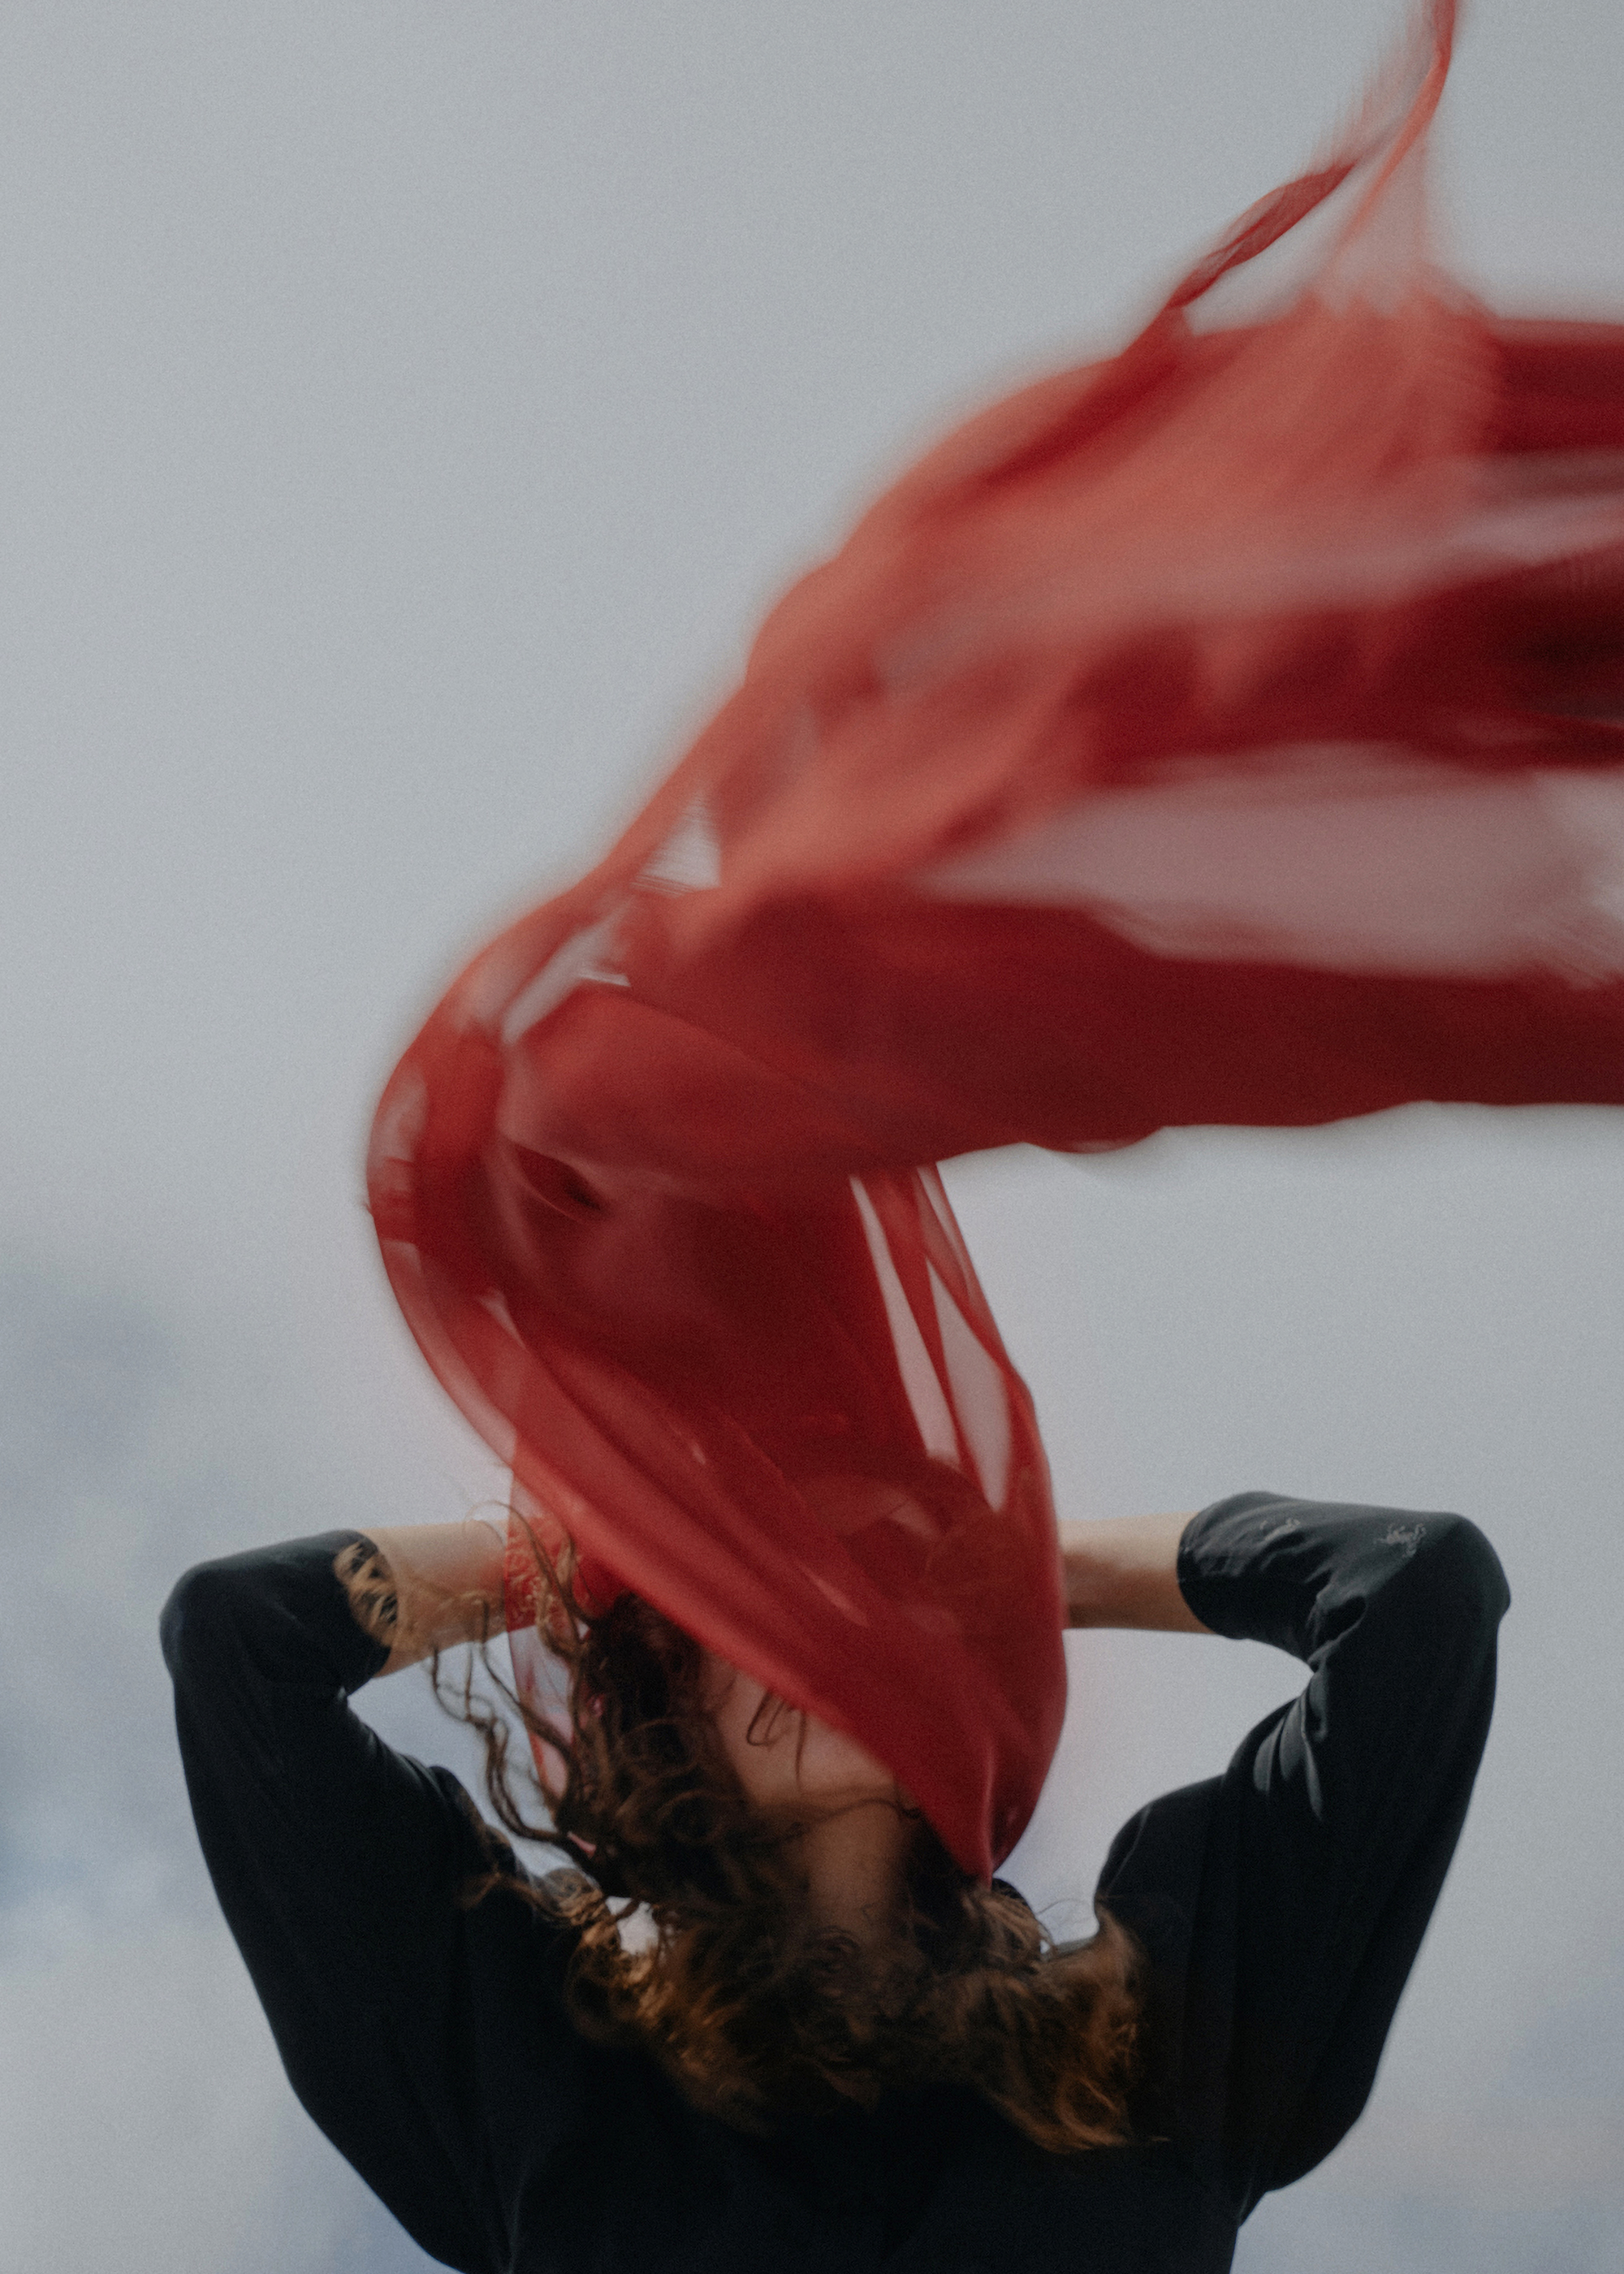 Wining photo of girl with flying fabric belarus conflict 2020 by photographer Krystsina Shyla